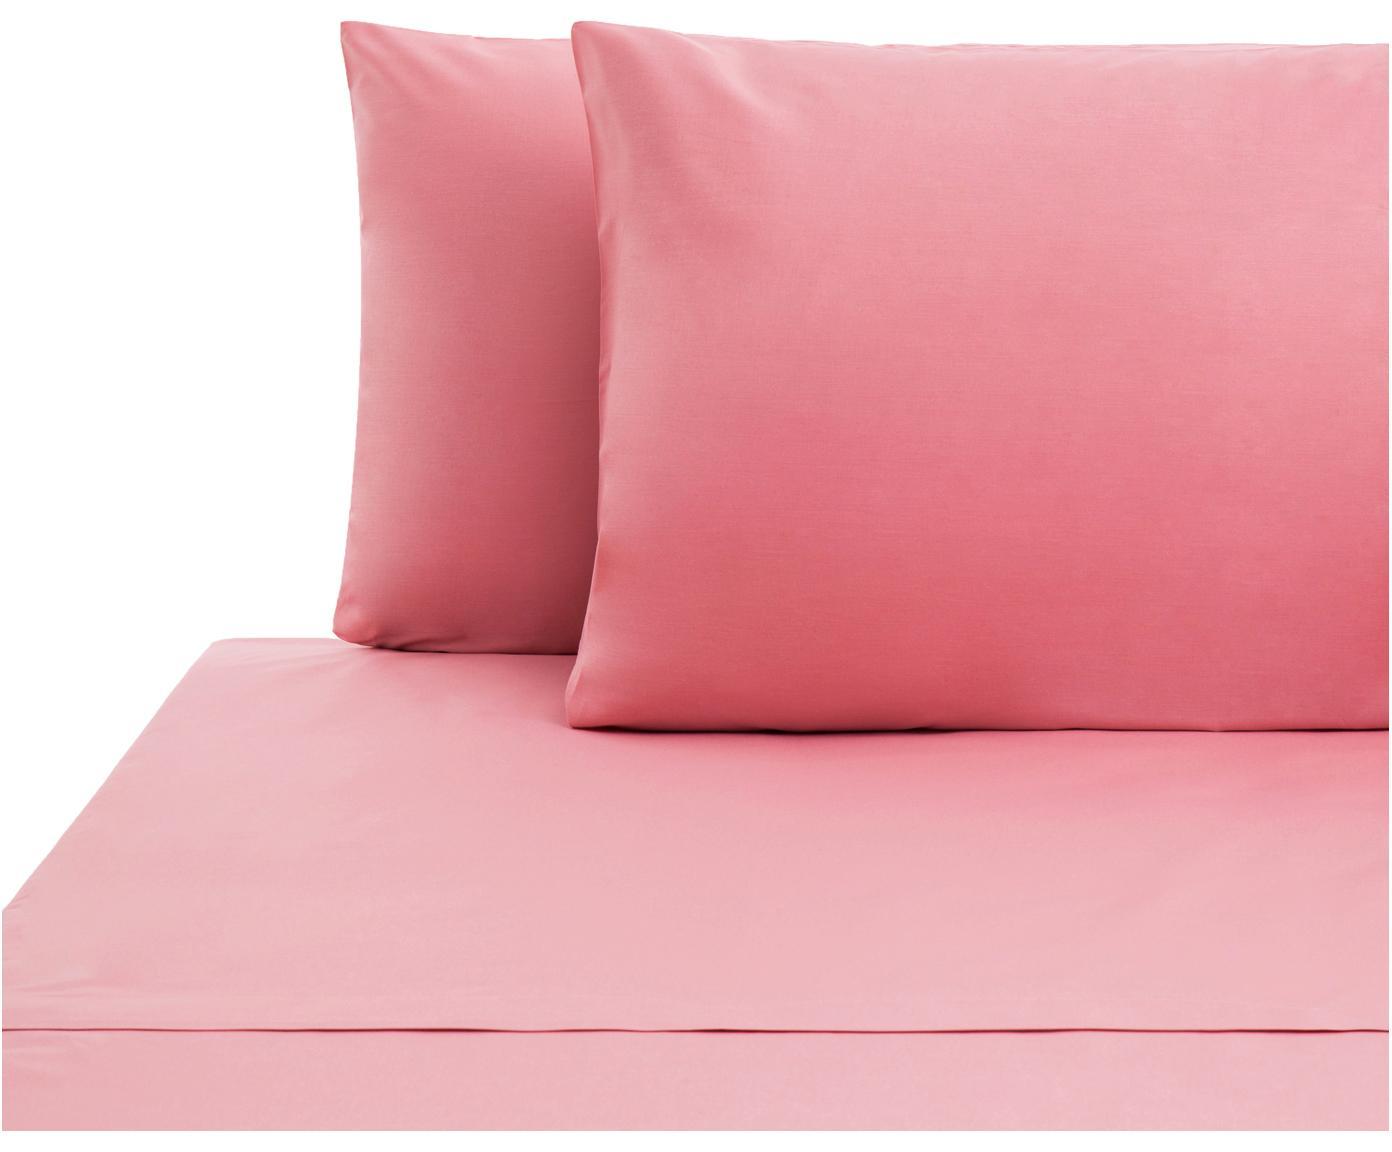 Set lenzuola in cotone ranforce Lenare 2 pz, Tessuto: Renforcé, Fronte e retro: rosa, 150 x 290 cm